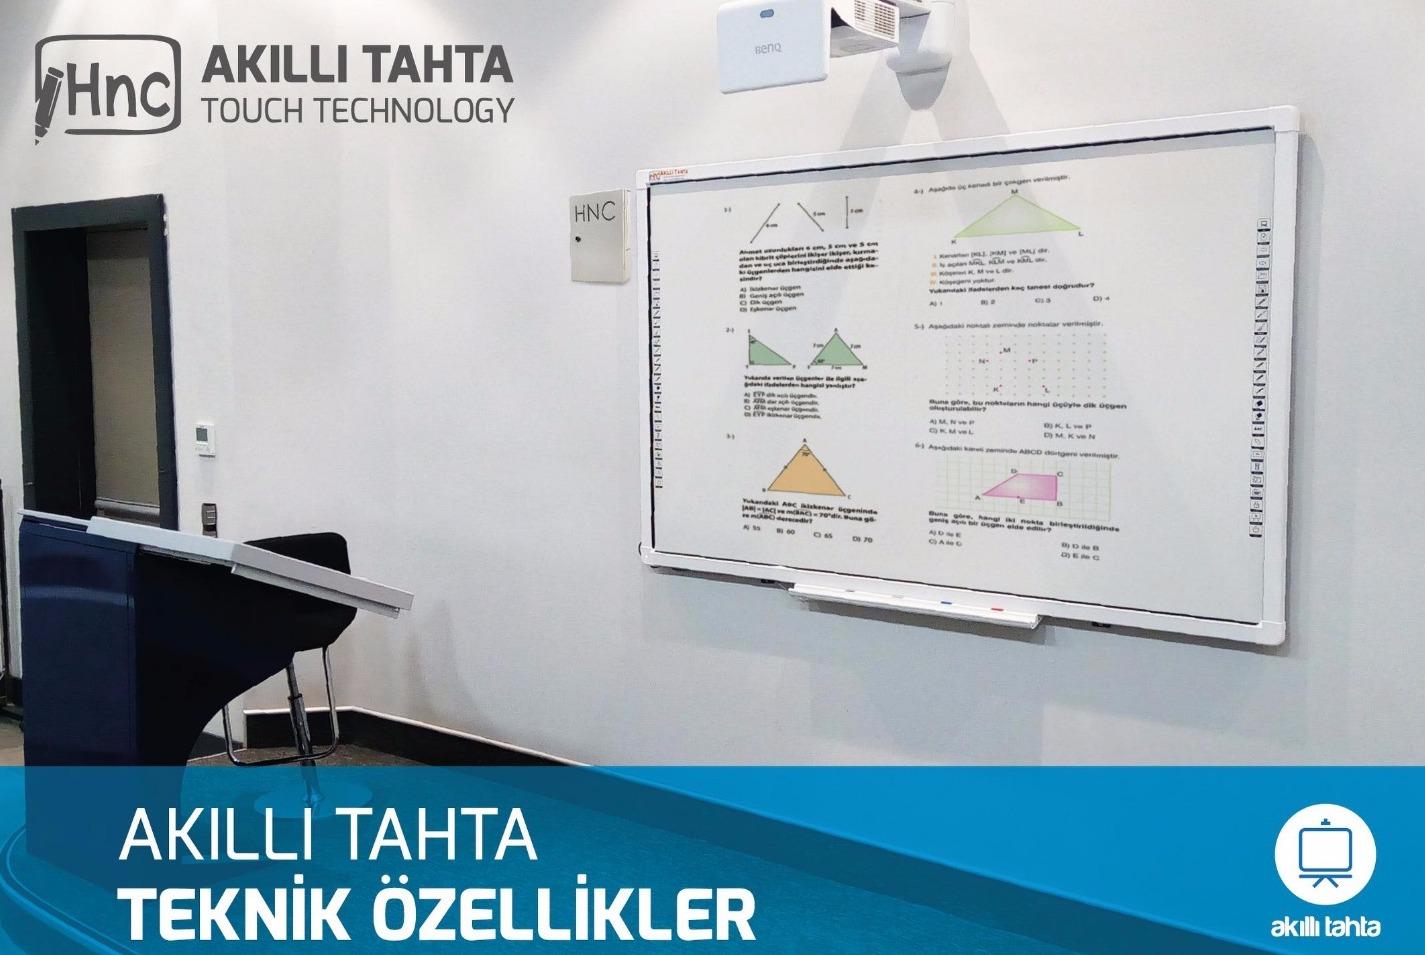 hnc_akillitahta_smartboard